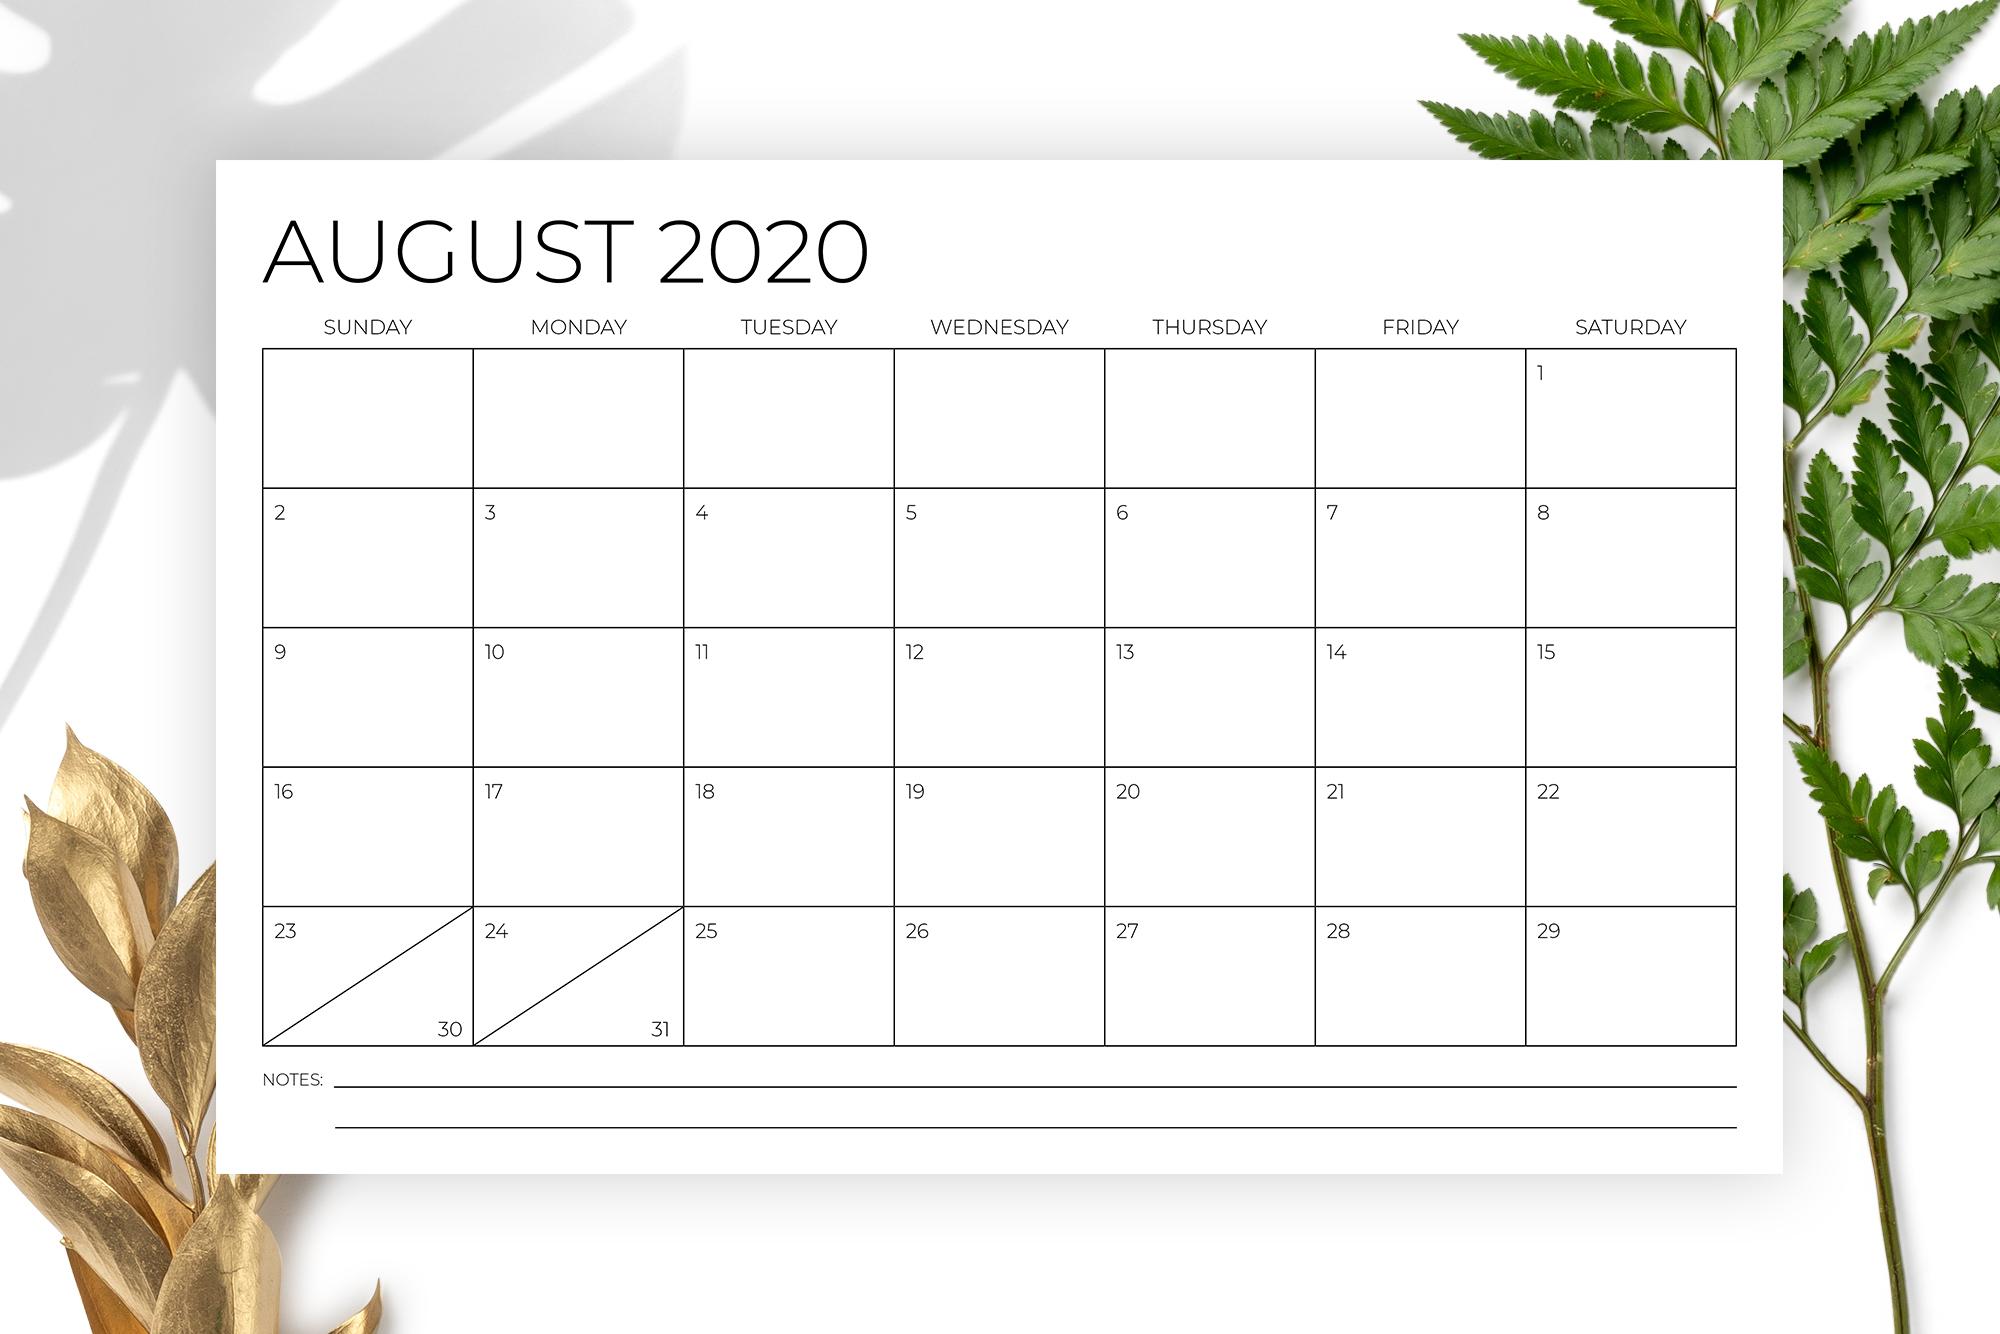 11 x 17 Inch Modern 2020 Calendar example image 4